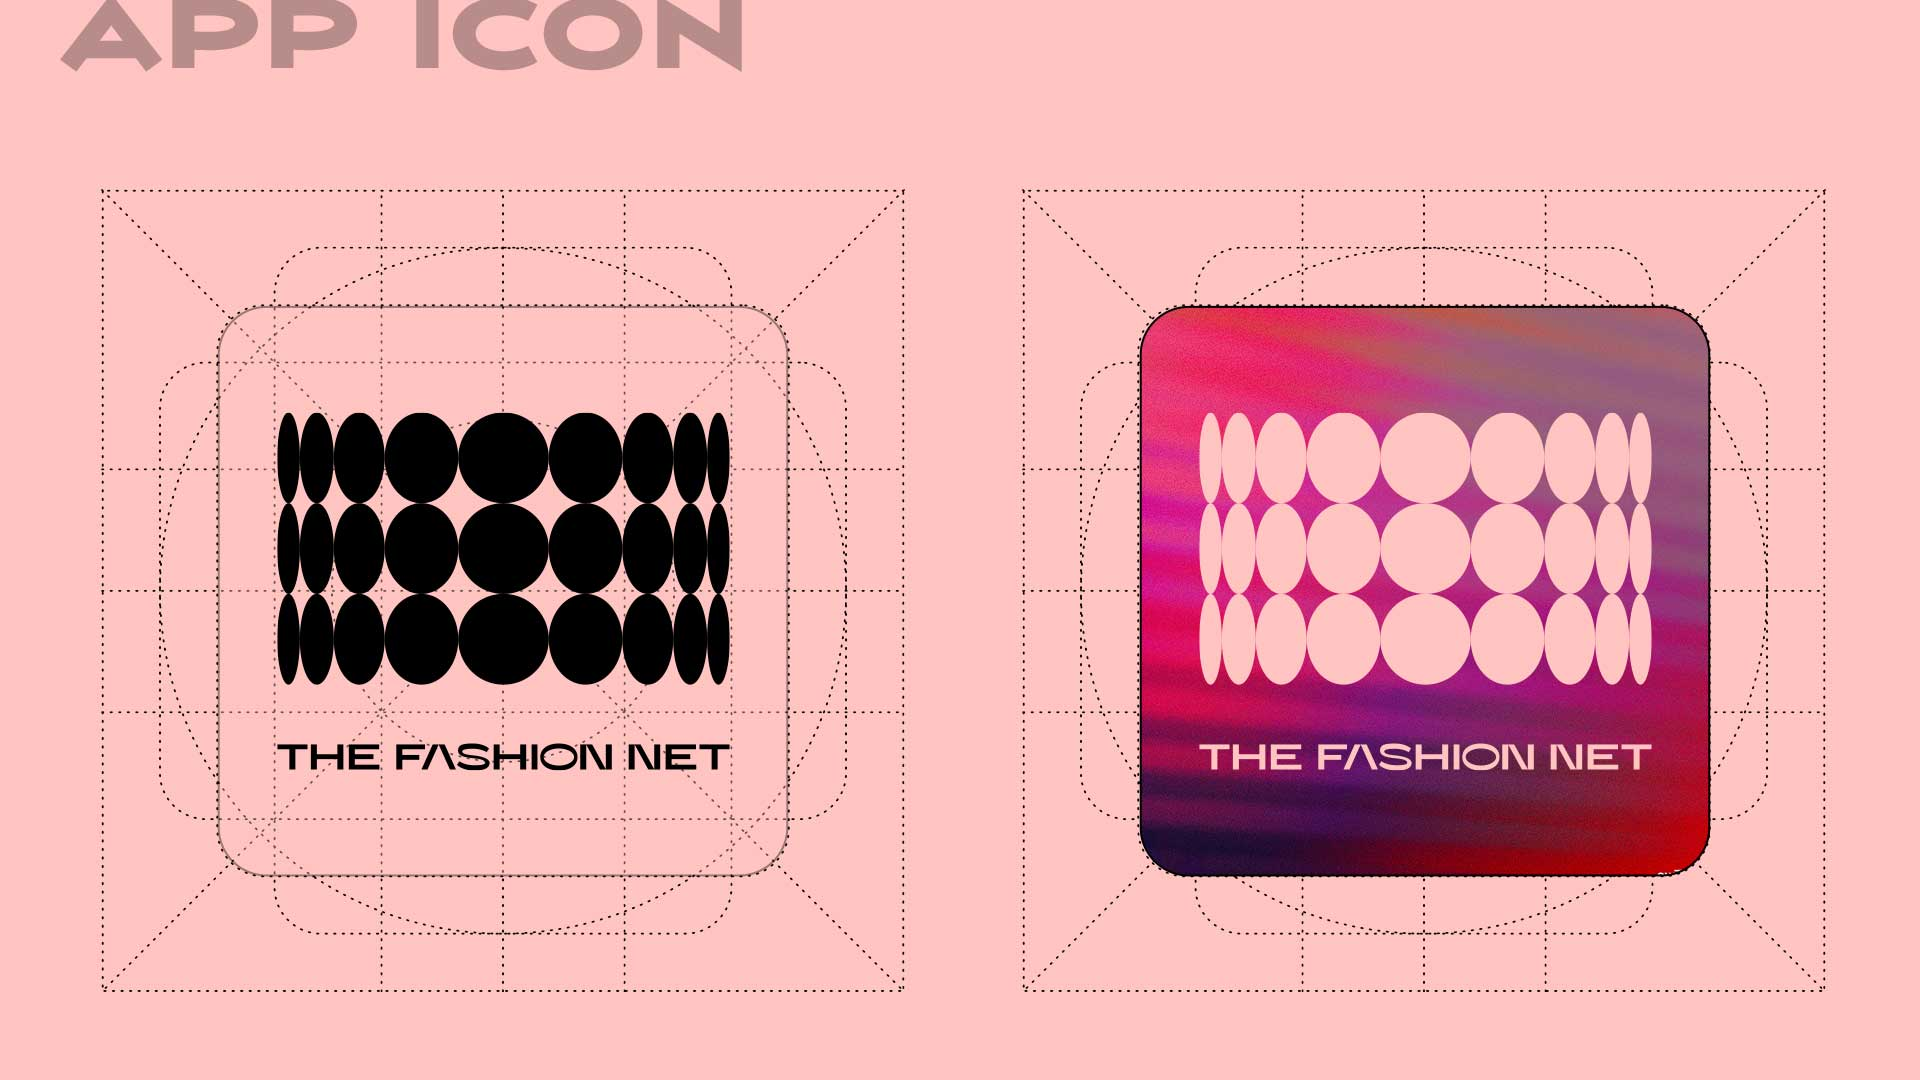 The Fashion Net Mobile App Icon